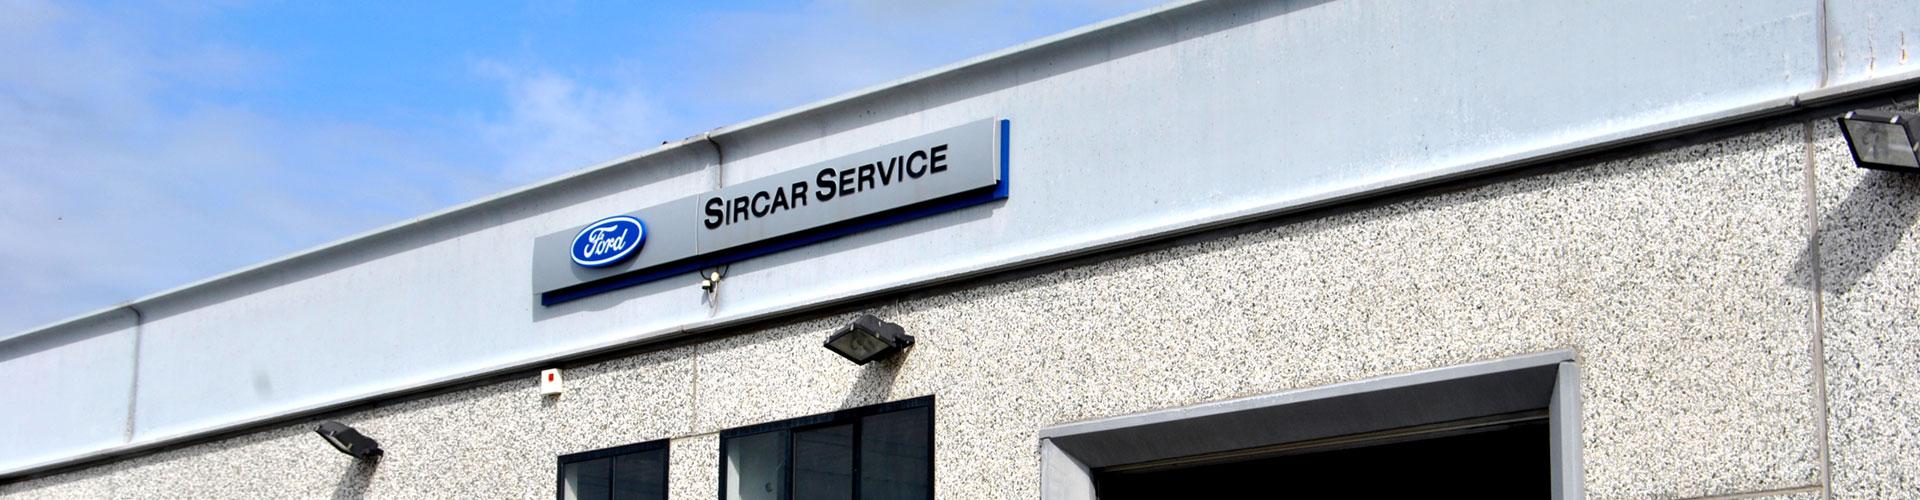 Ford SirCar Service Ladispoli